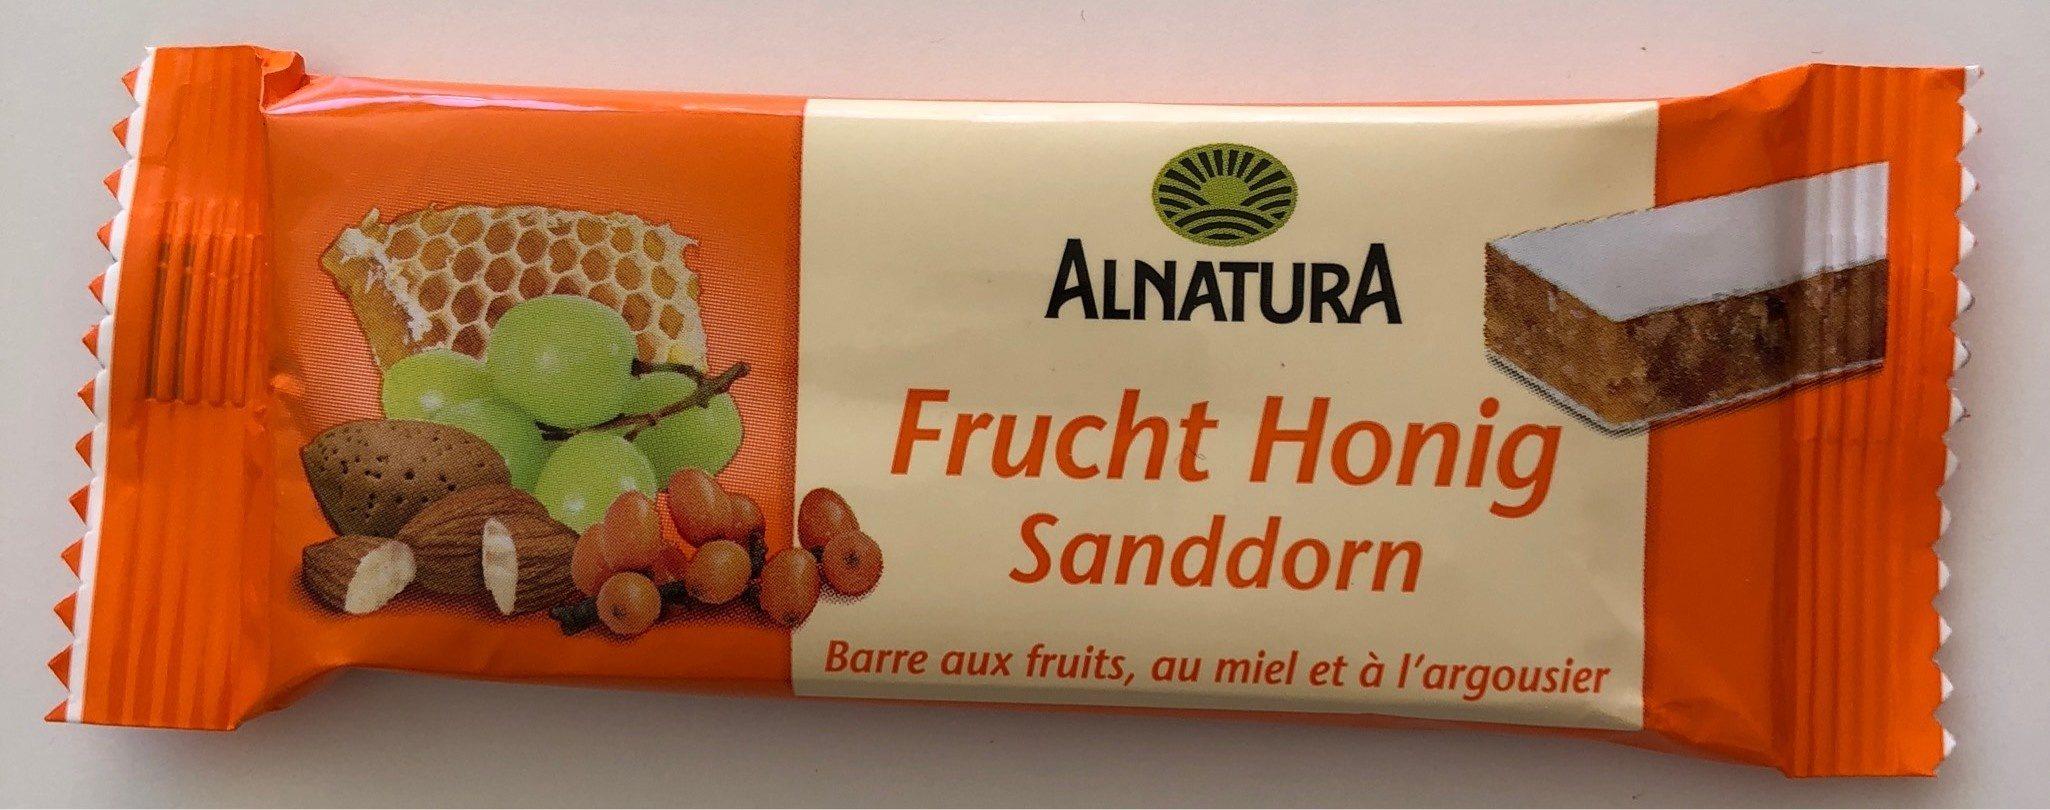 Frucht Honig Sanddorn - Produit - fr